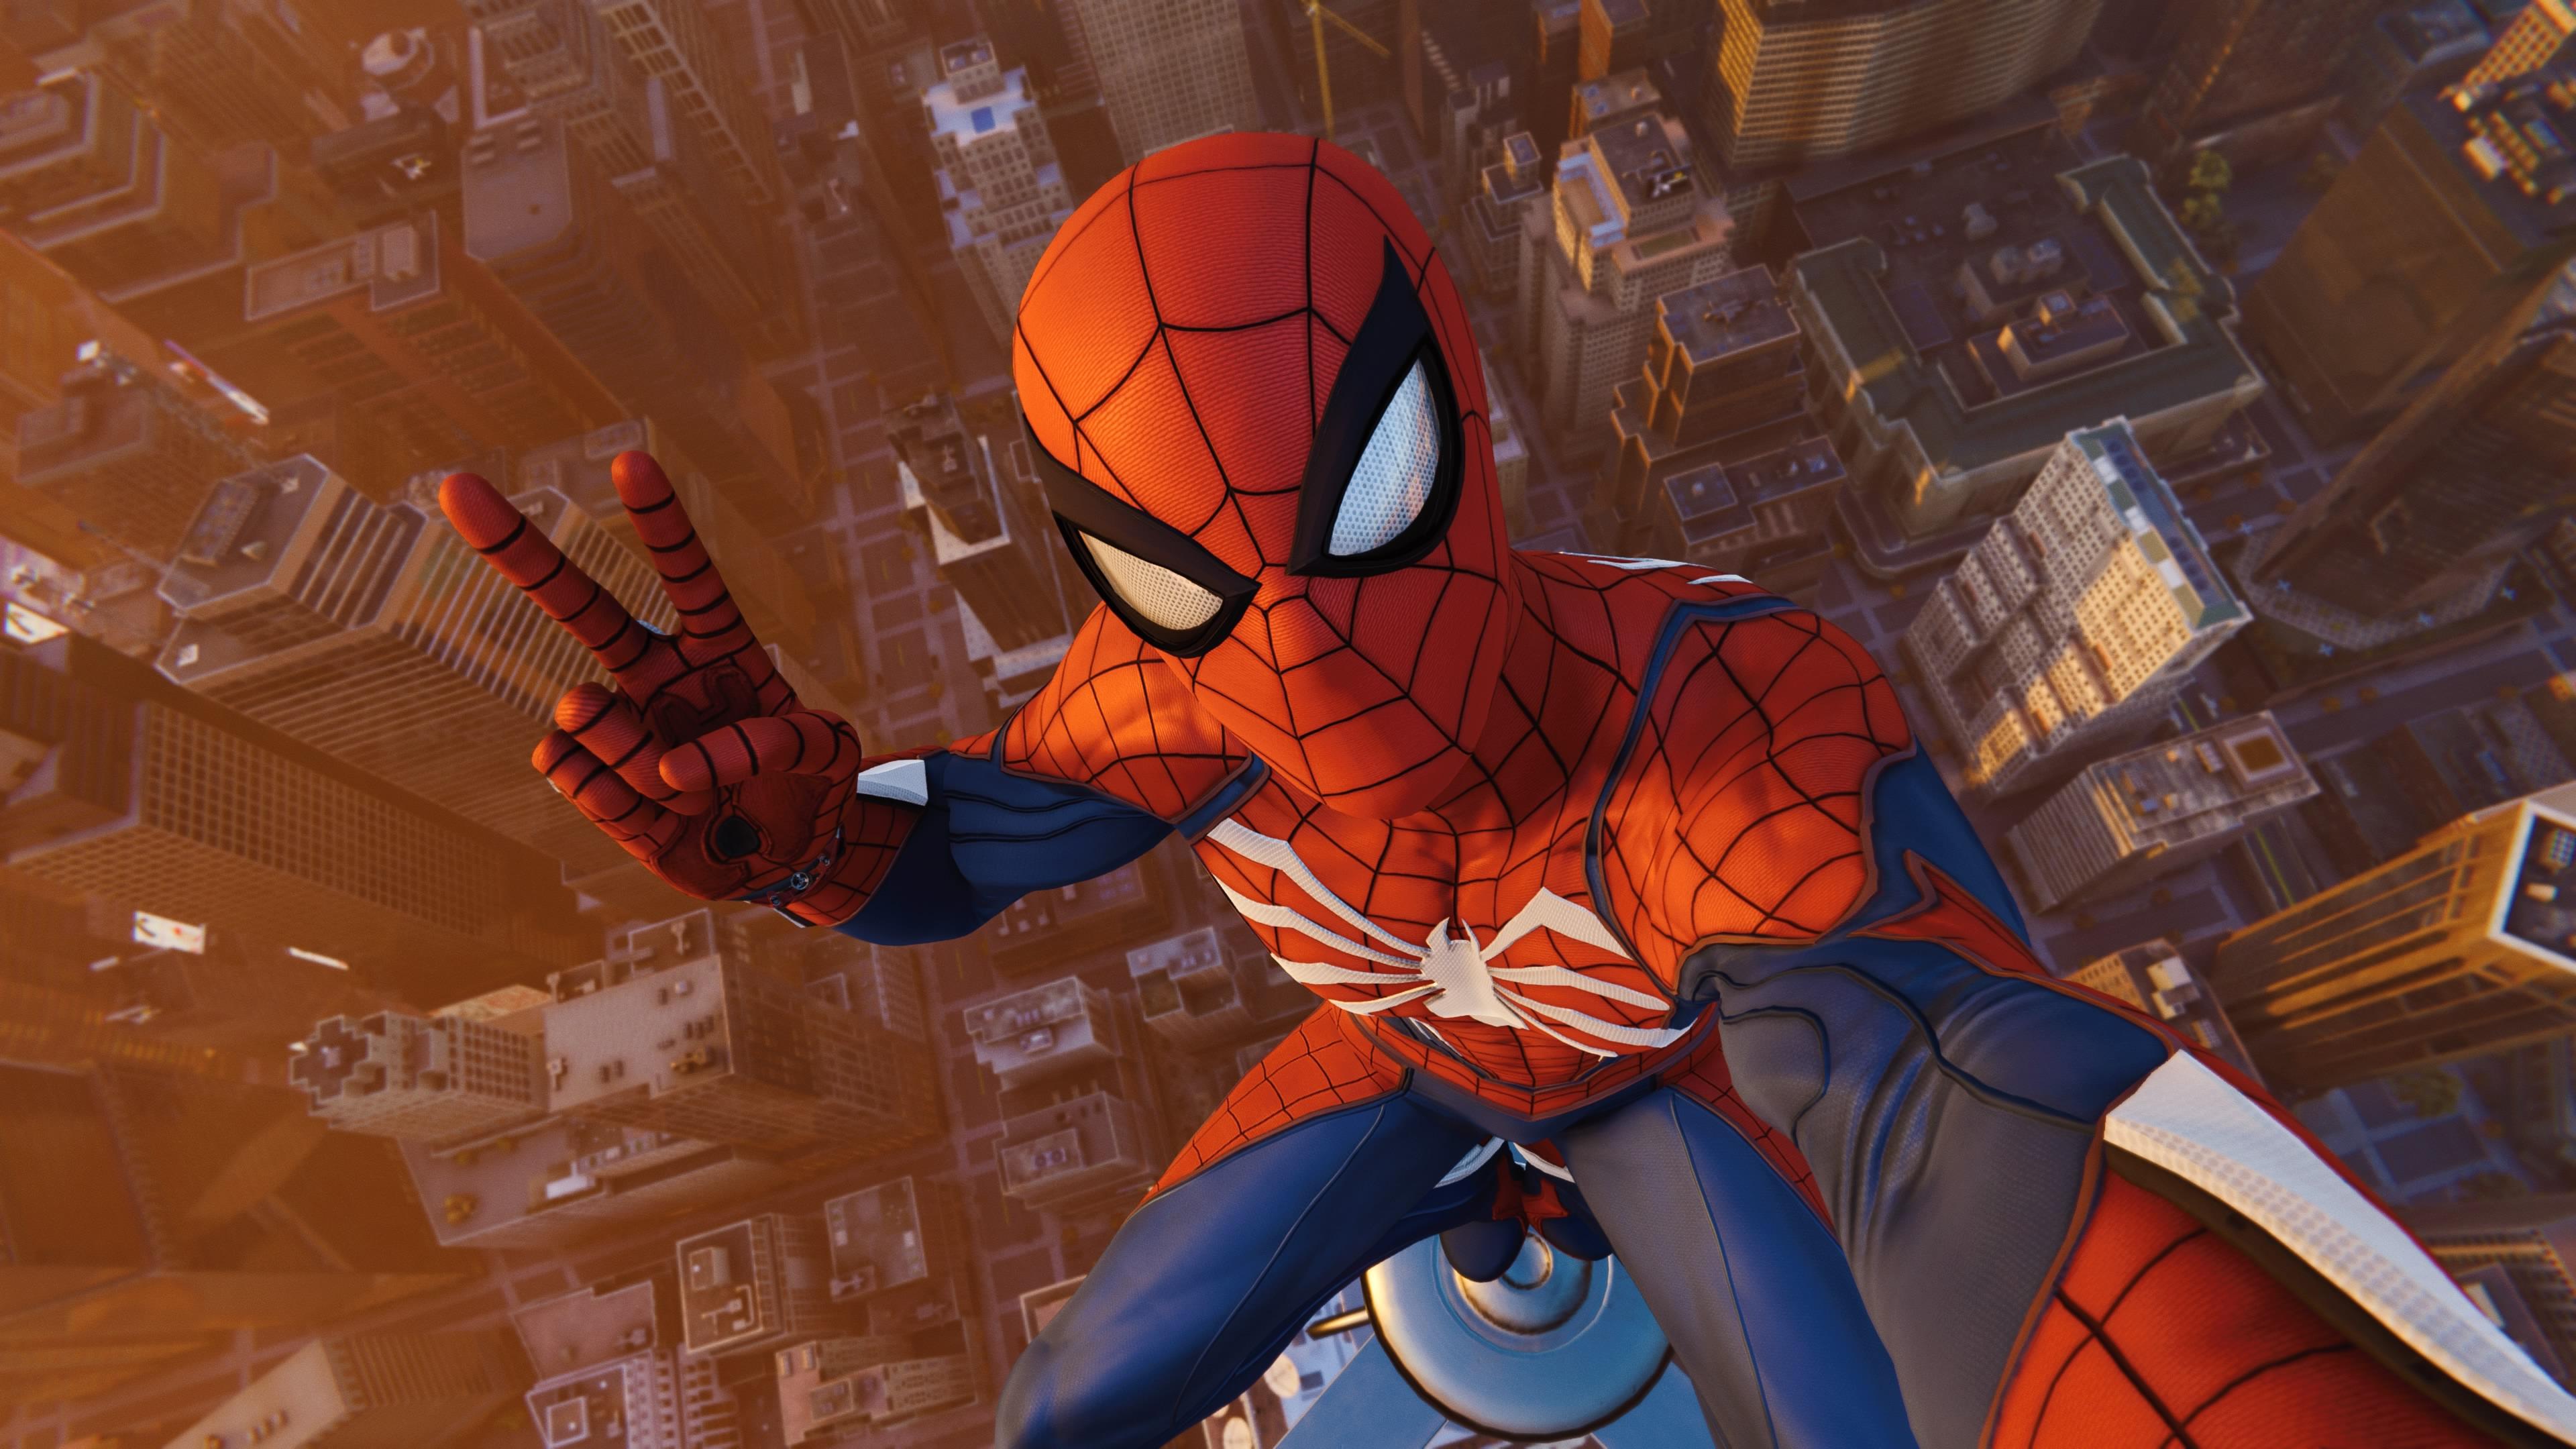 ps4 pro spiderman 1538343586 - Ps4 Pro Spiderman - superheroes wallpapers, spiderman wallpapers, ps4 games wallpapers, ps games wallpapers, hd-wallpapers, games wallpapers, 4k-wallpapers